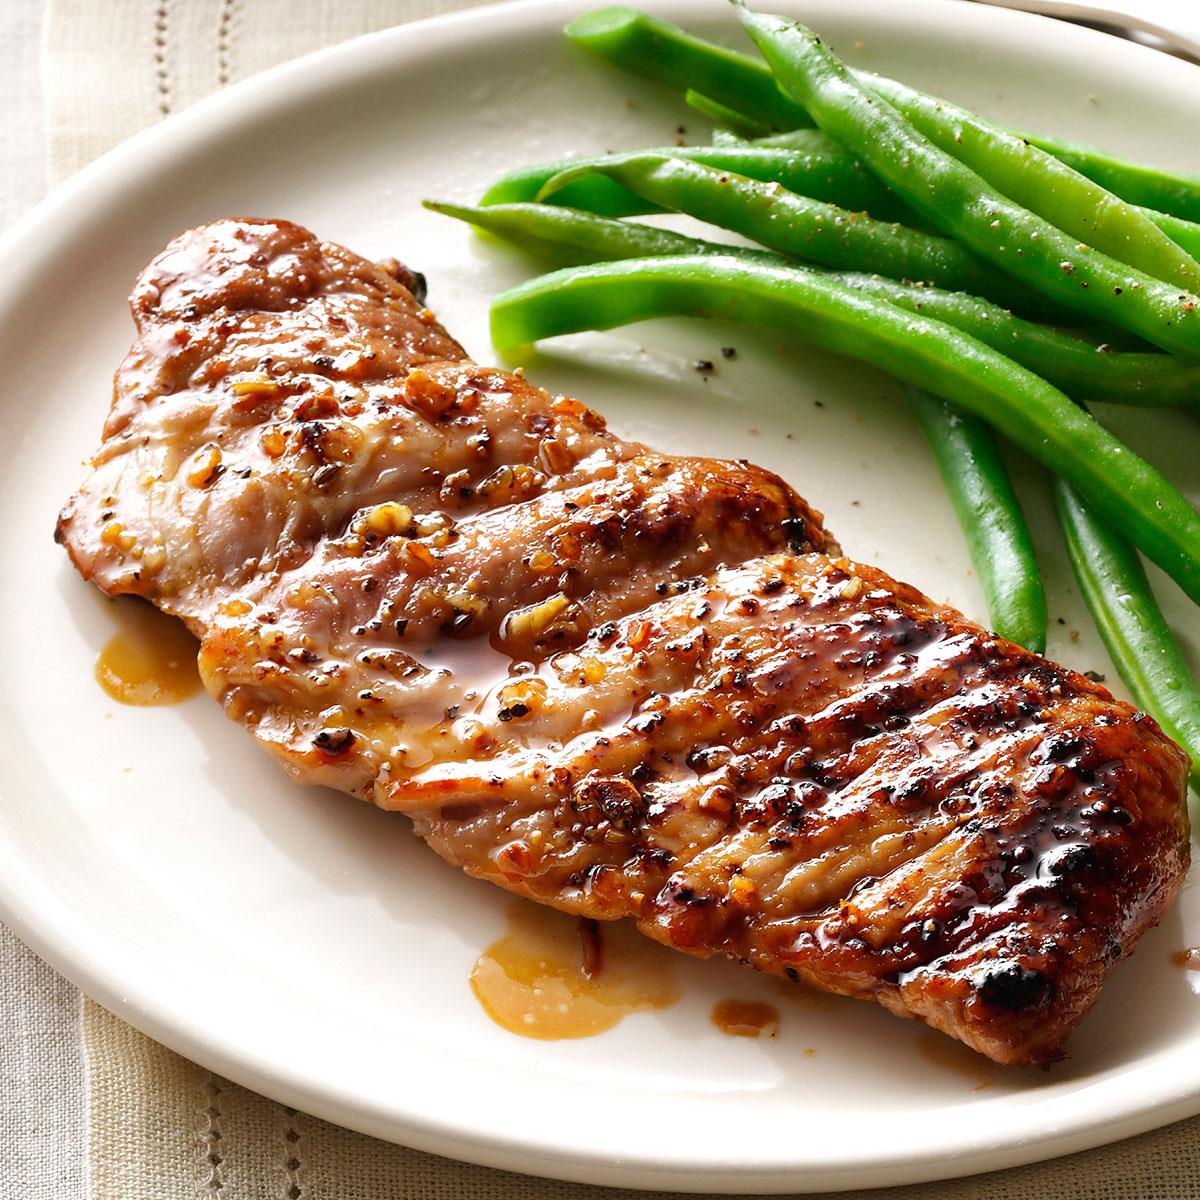 pork tenderloin recipe caramelized recipes taste grilled minutes ready